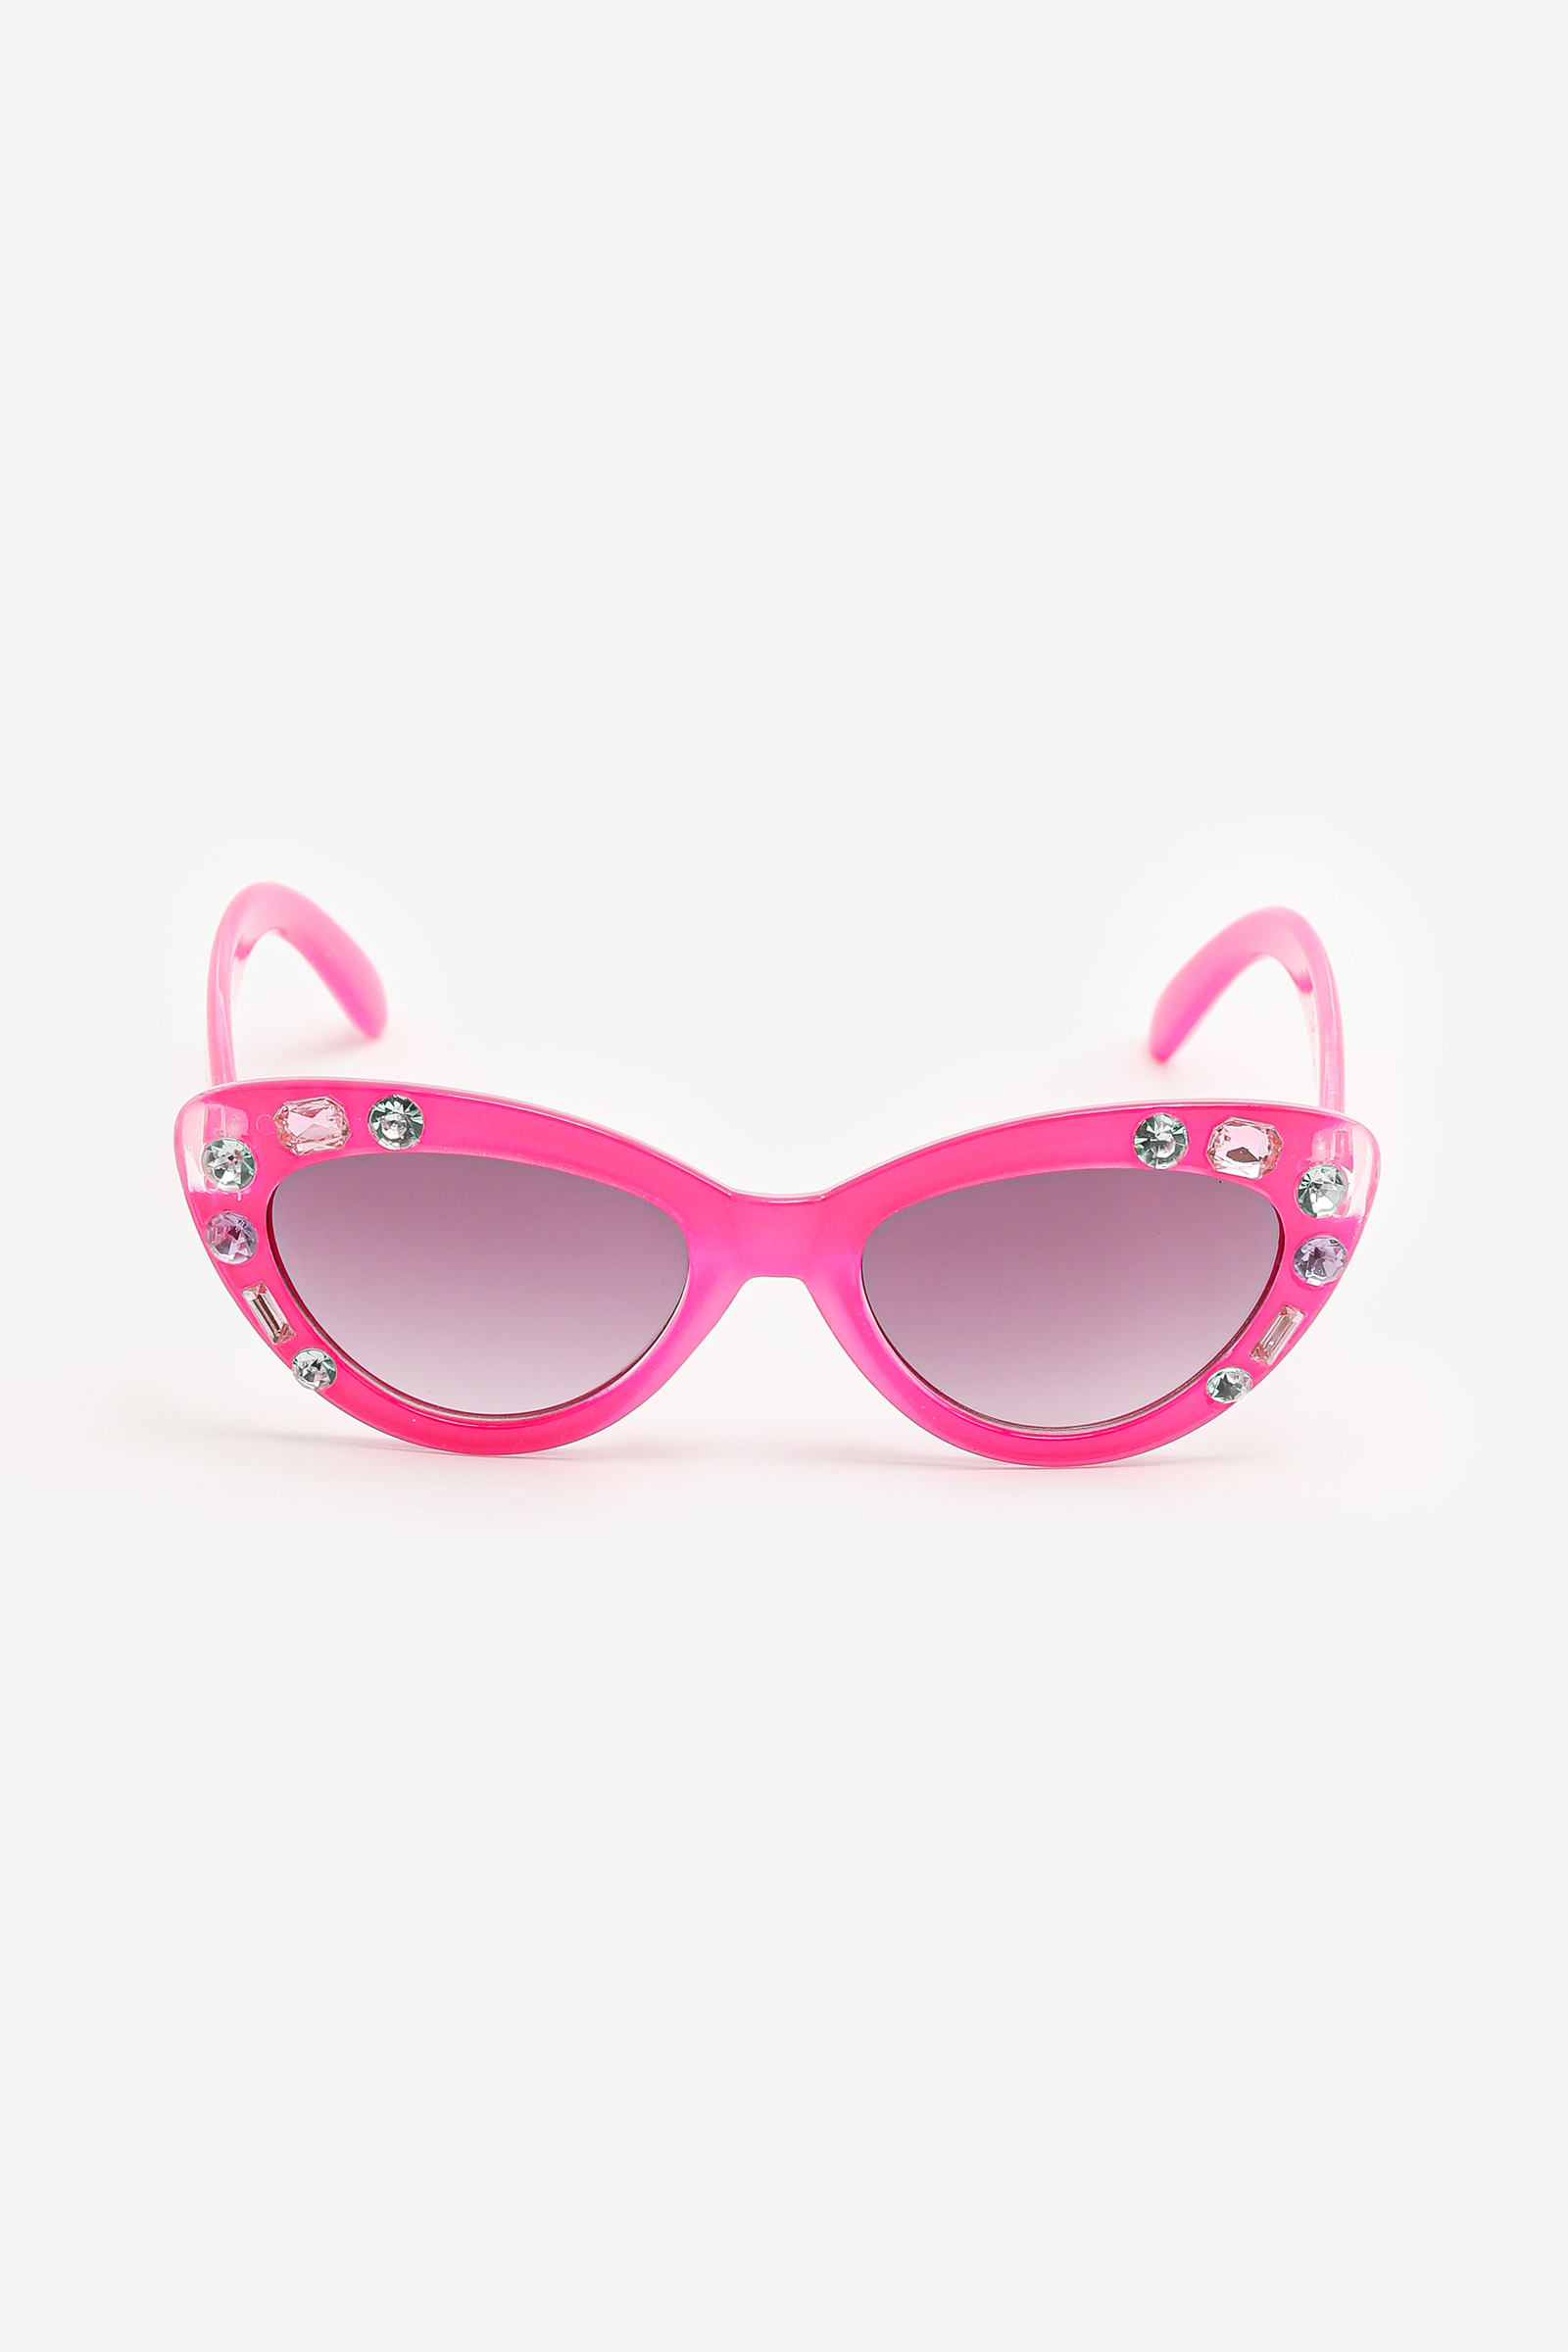 Jeweled Cat Eye Sunglasses for Kids